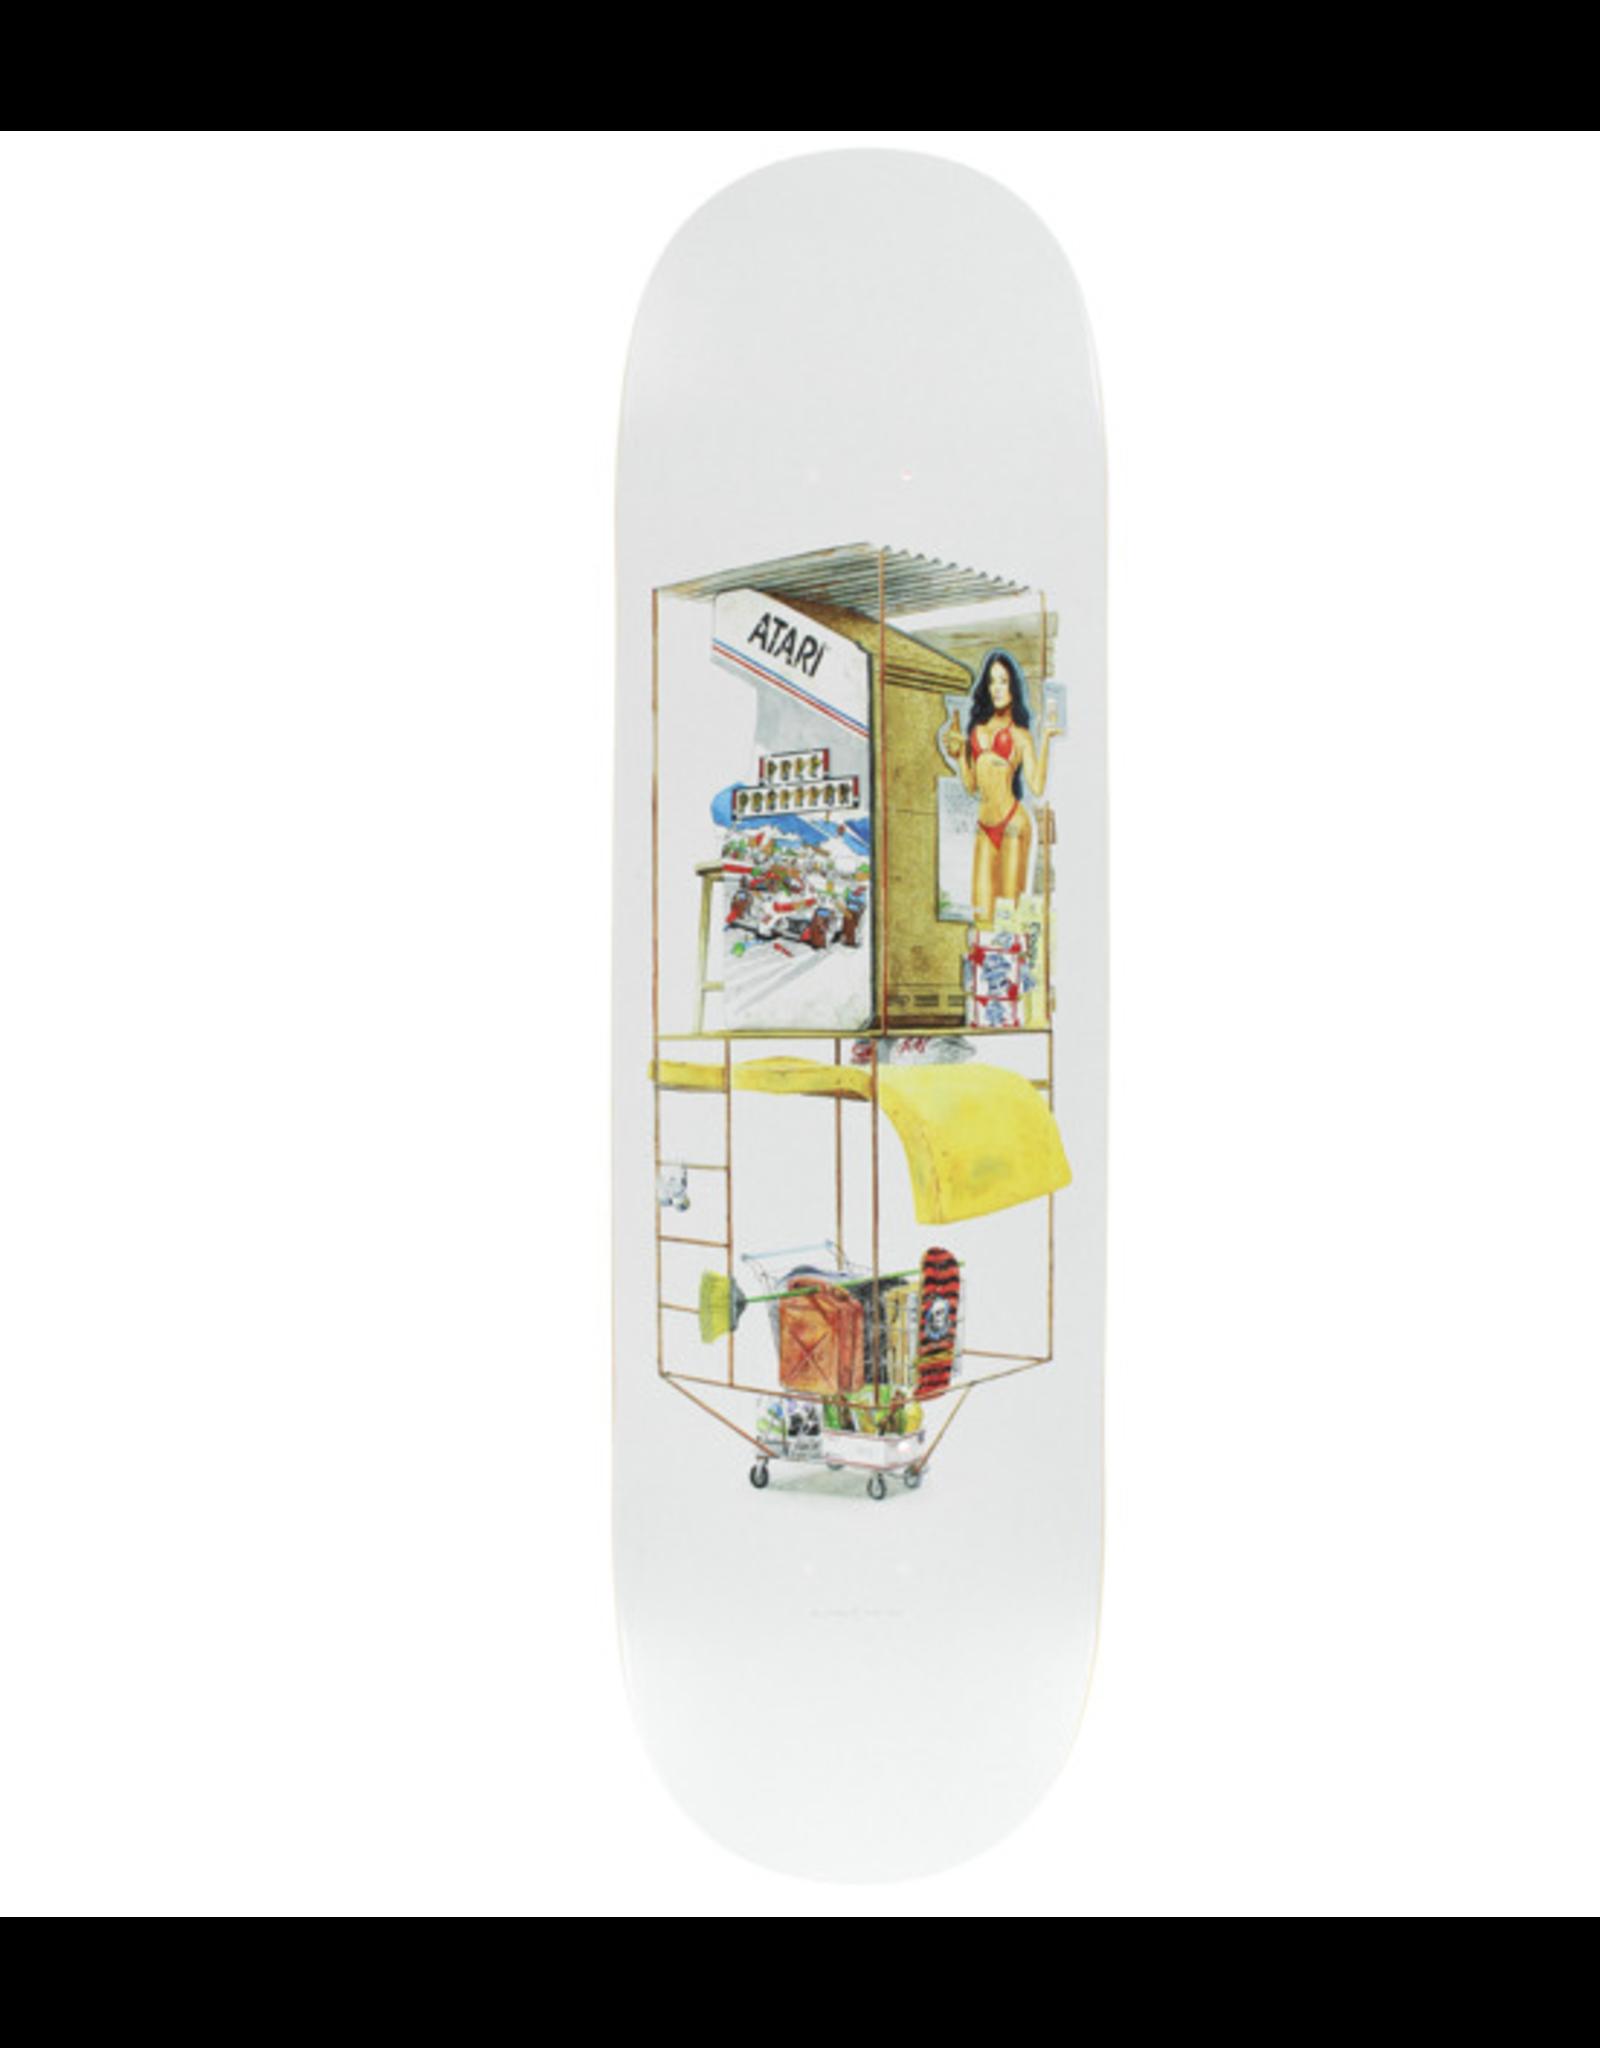 "Bacon Skateboards Coin Operation Skateboard Deck - 8.5"" x 32"""